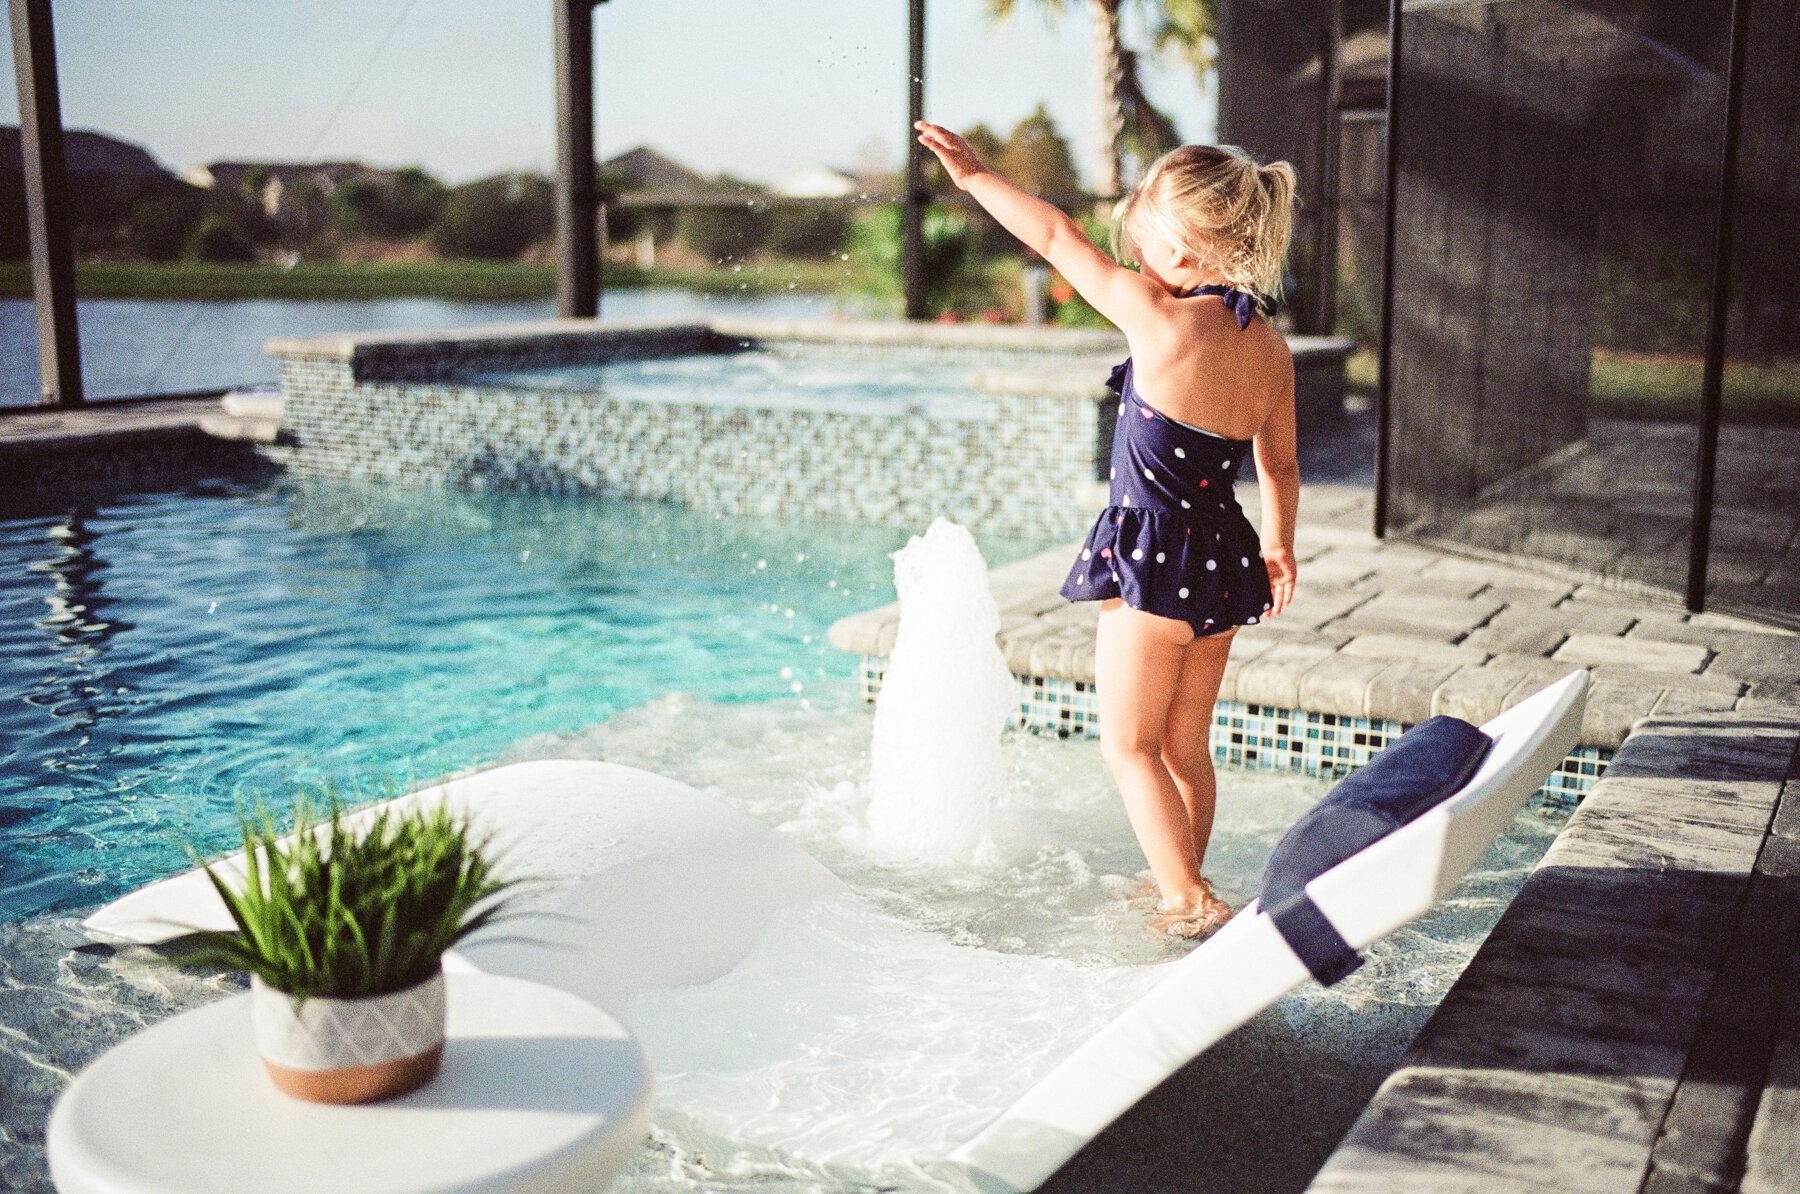 Leica-M6-Pool-Chloe-26.jpg